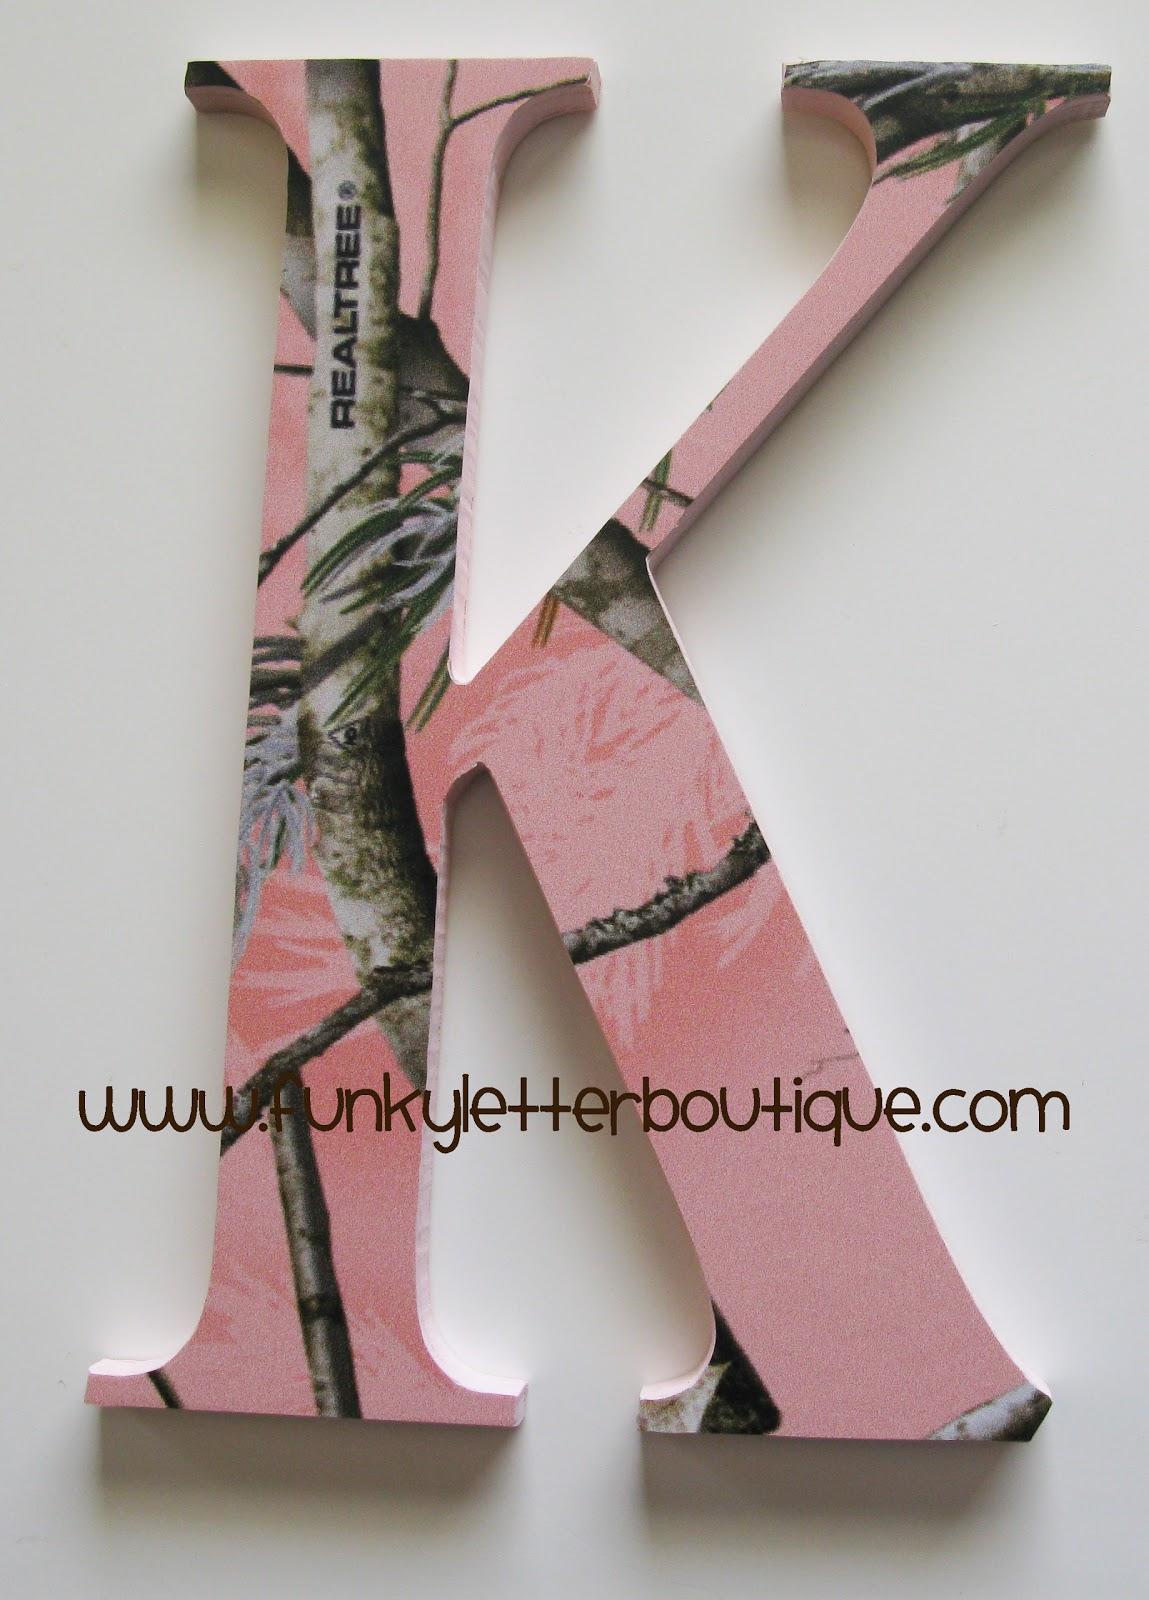 http://4.bp.blogspot.com/-Jdf0qbzjUOA/UEaFx6i1TbI/AAAAAAAAAXc/fgF3nBjnk4U/s1600/Pink+Realtree+Camo+Letter.jpg